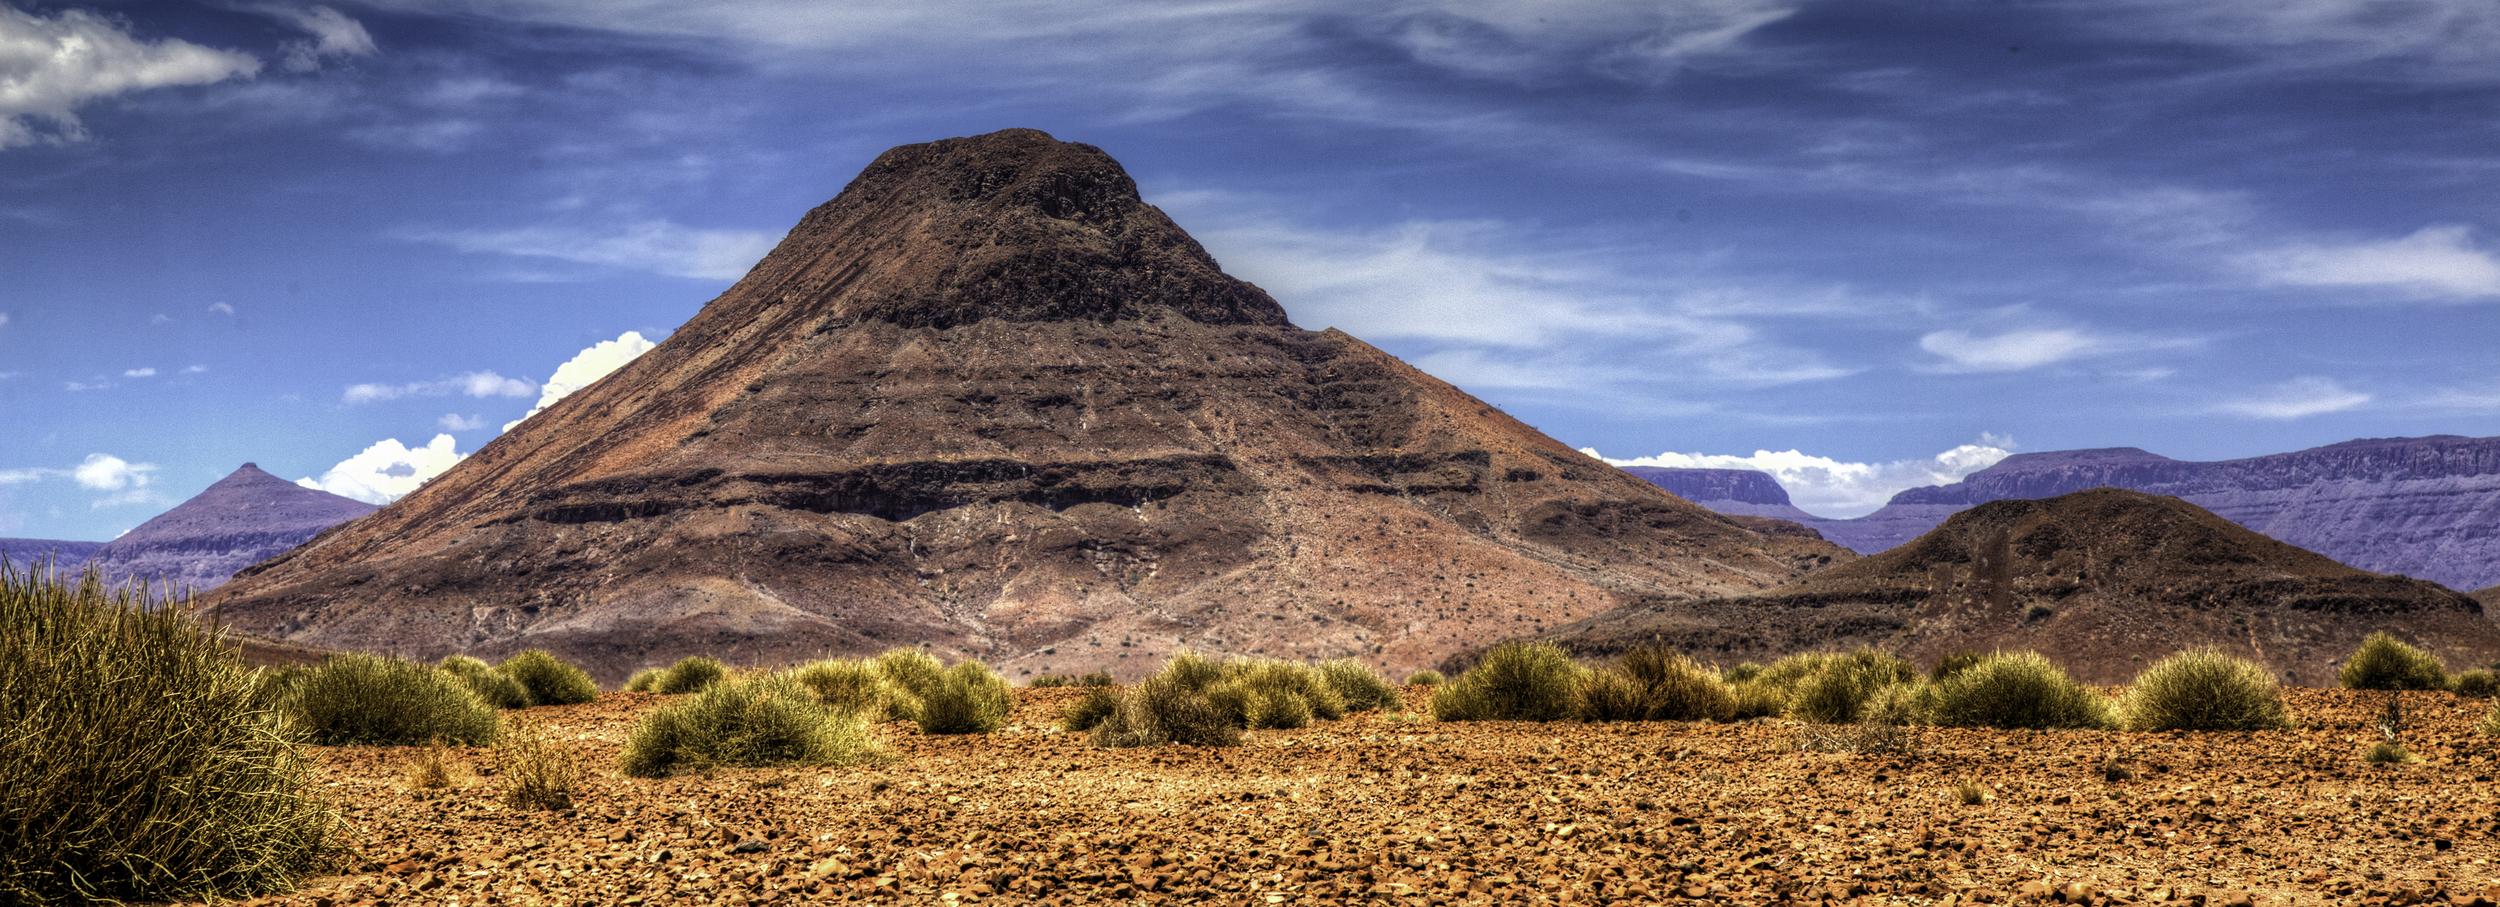 The Mysterious Pyramid Mountain